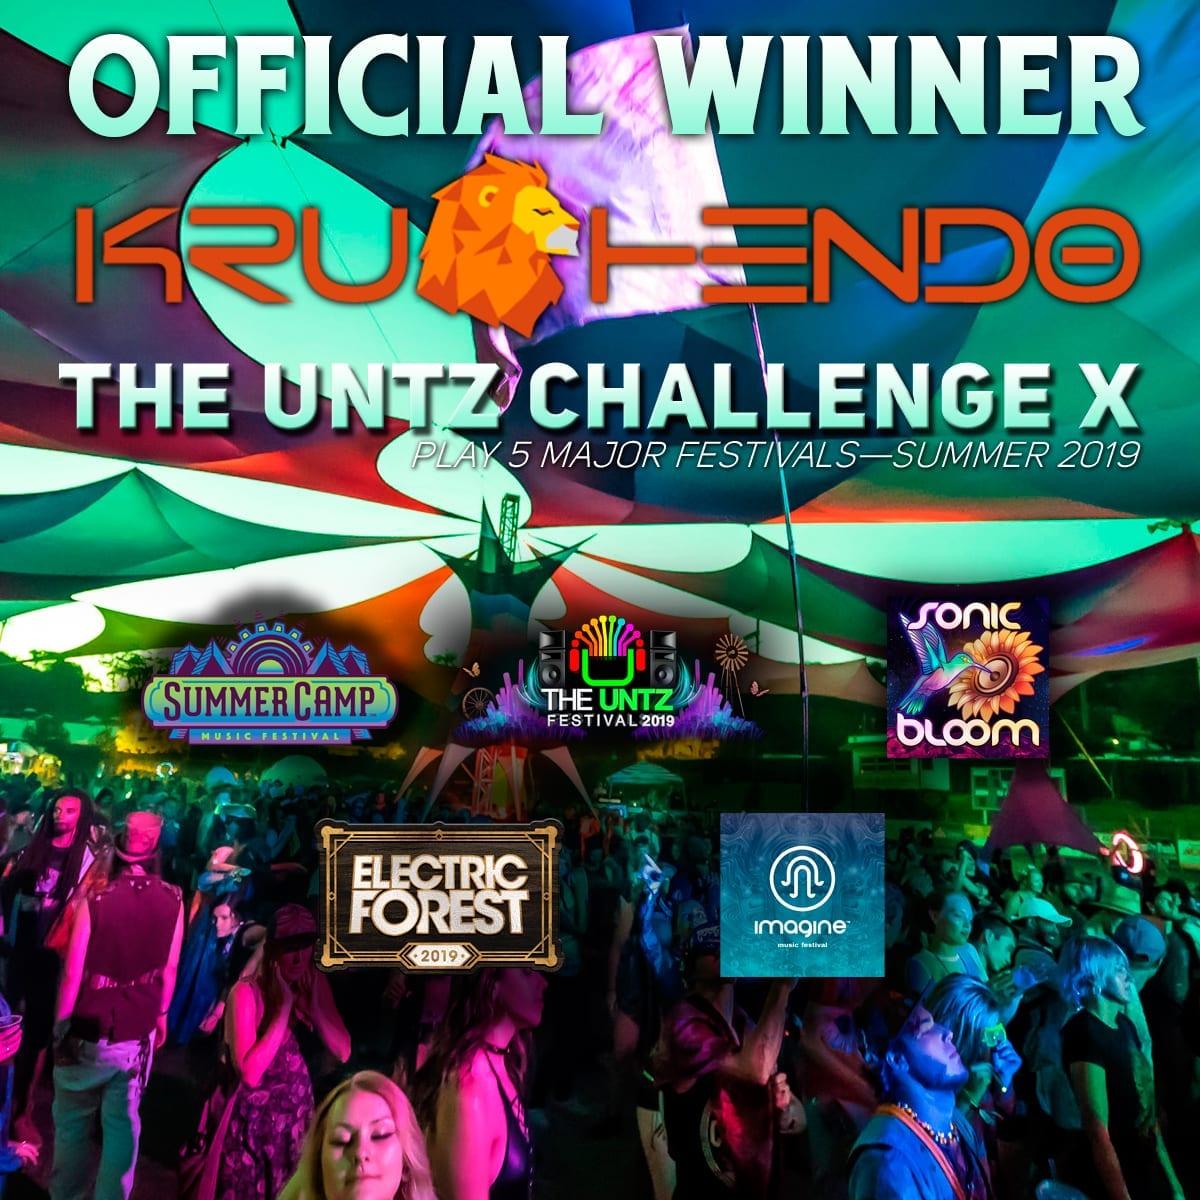 Krushendo Official Untz Challenge X Winner!